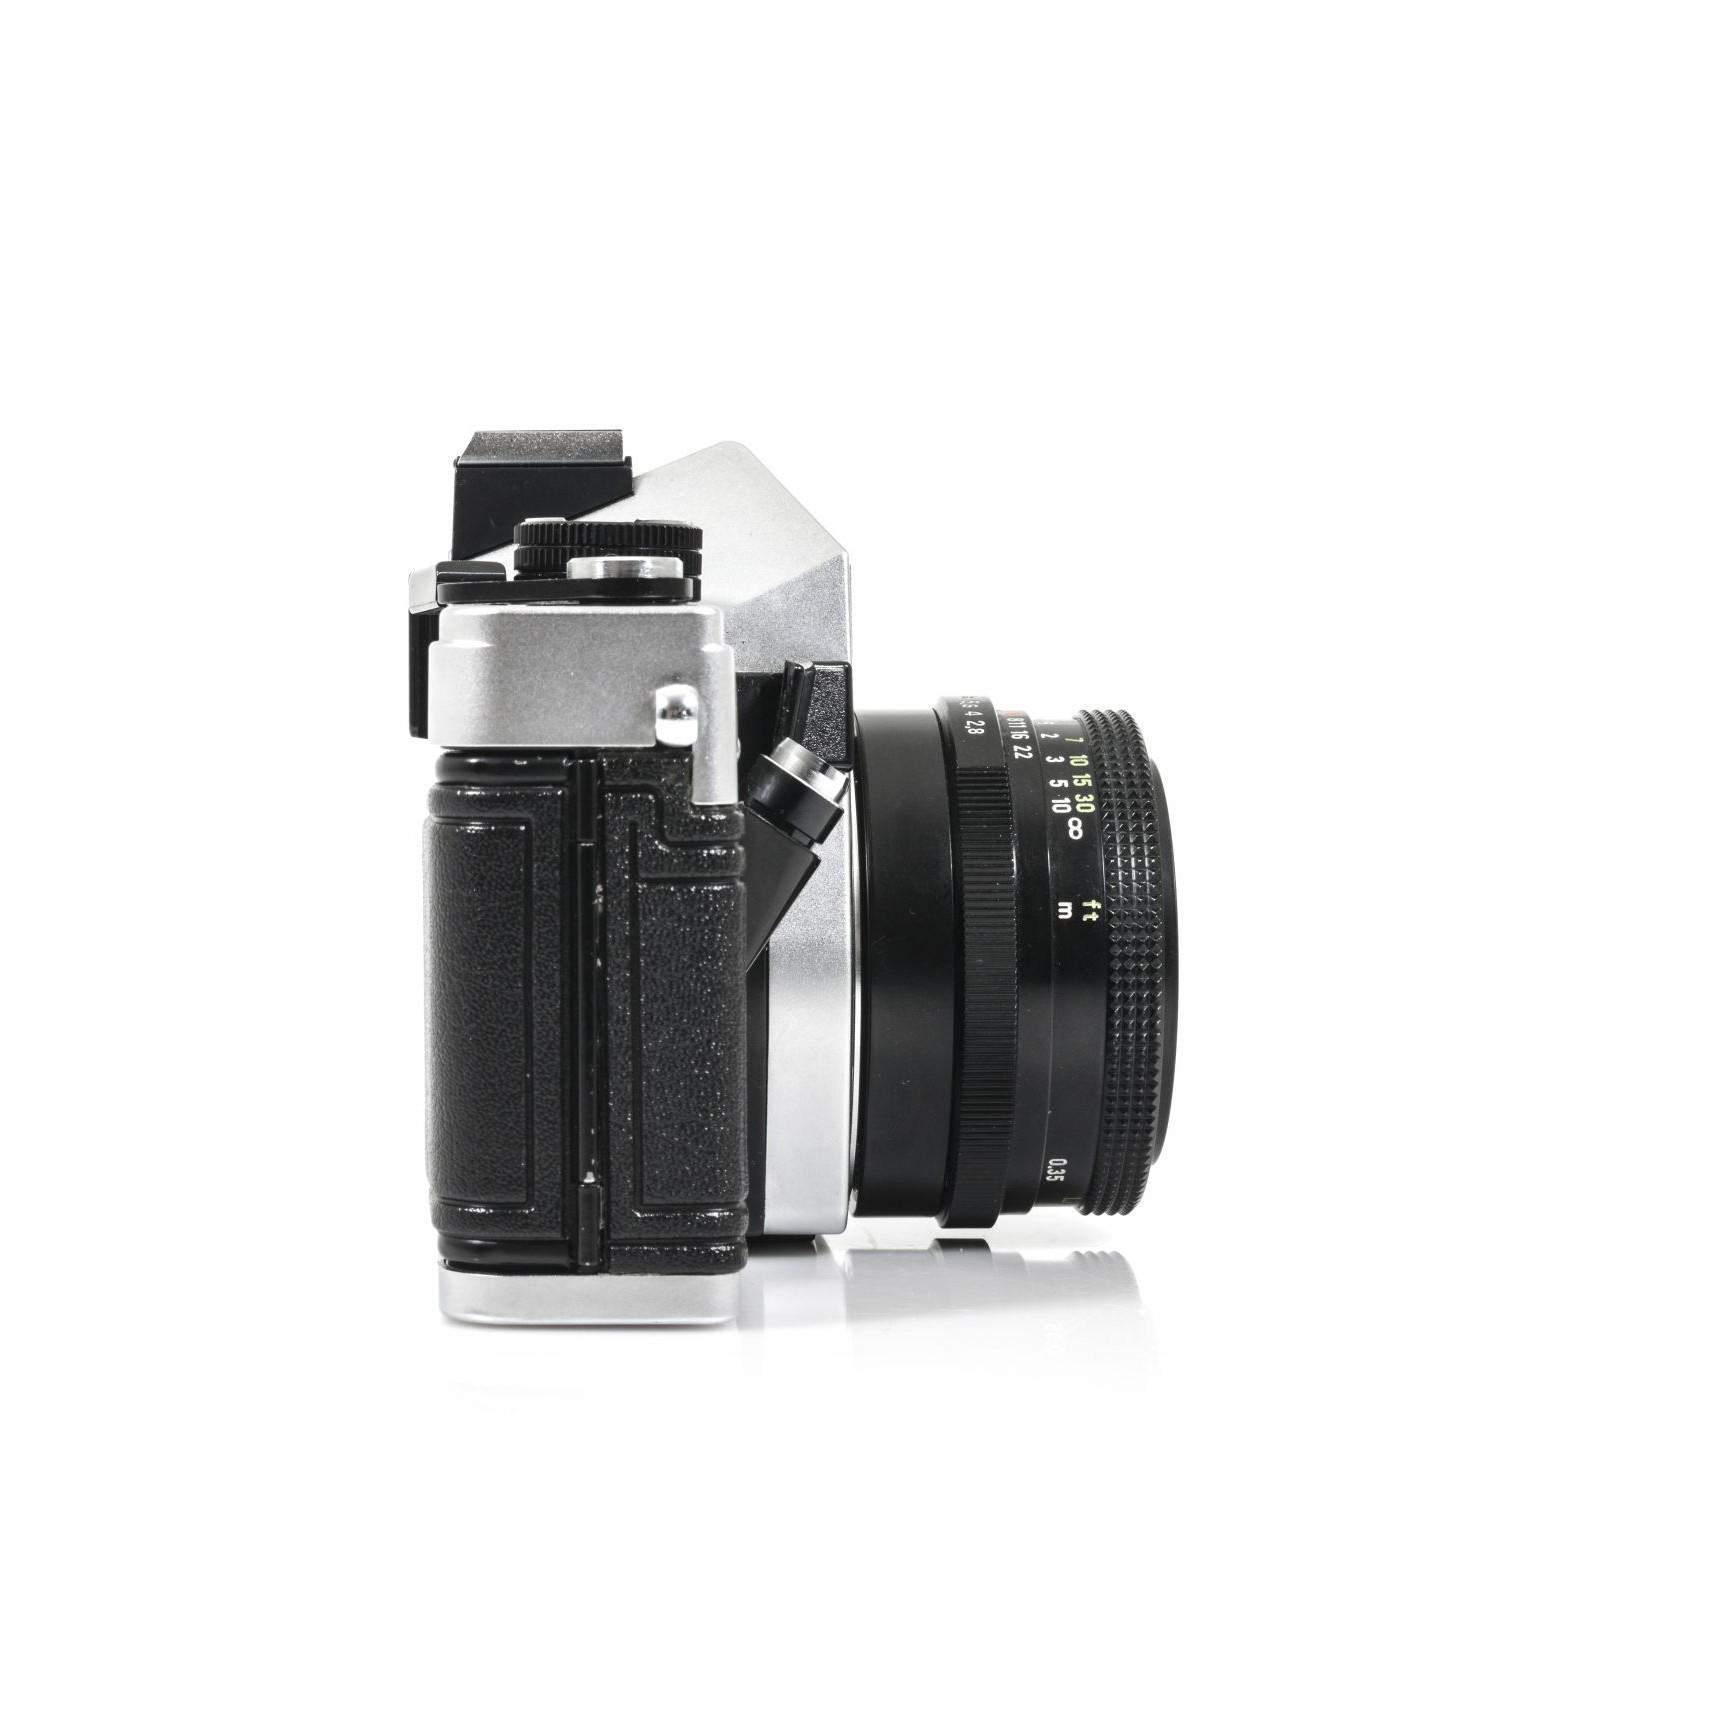 Gorgeous Praktica MTL 5 35mm Film Camera + Tessar 2.8/50 Carl Zeiss Jena DDR Lens